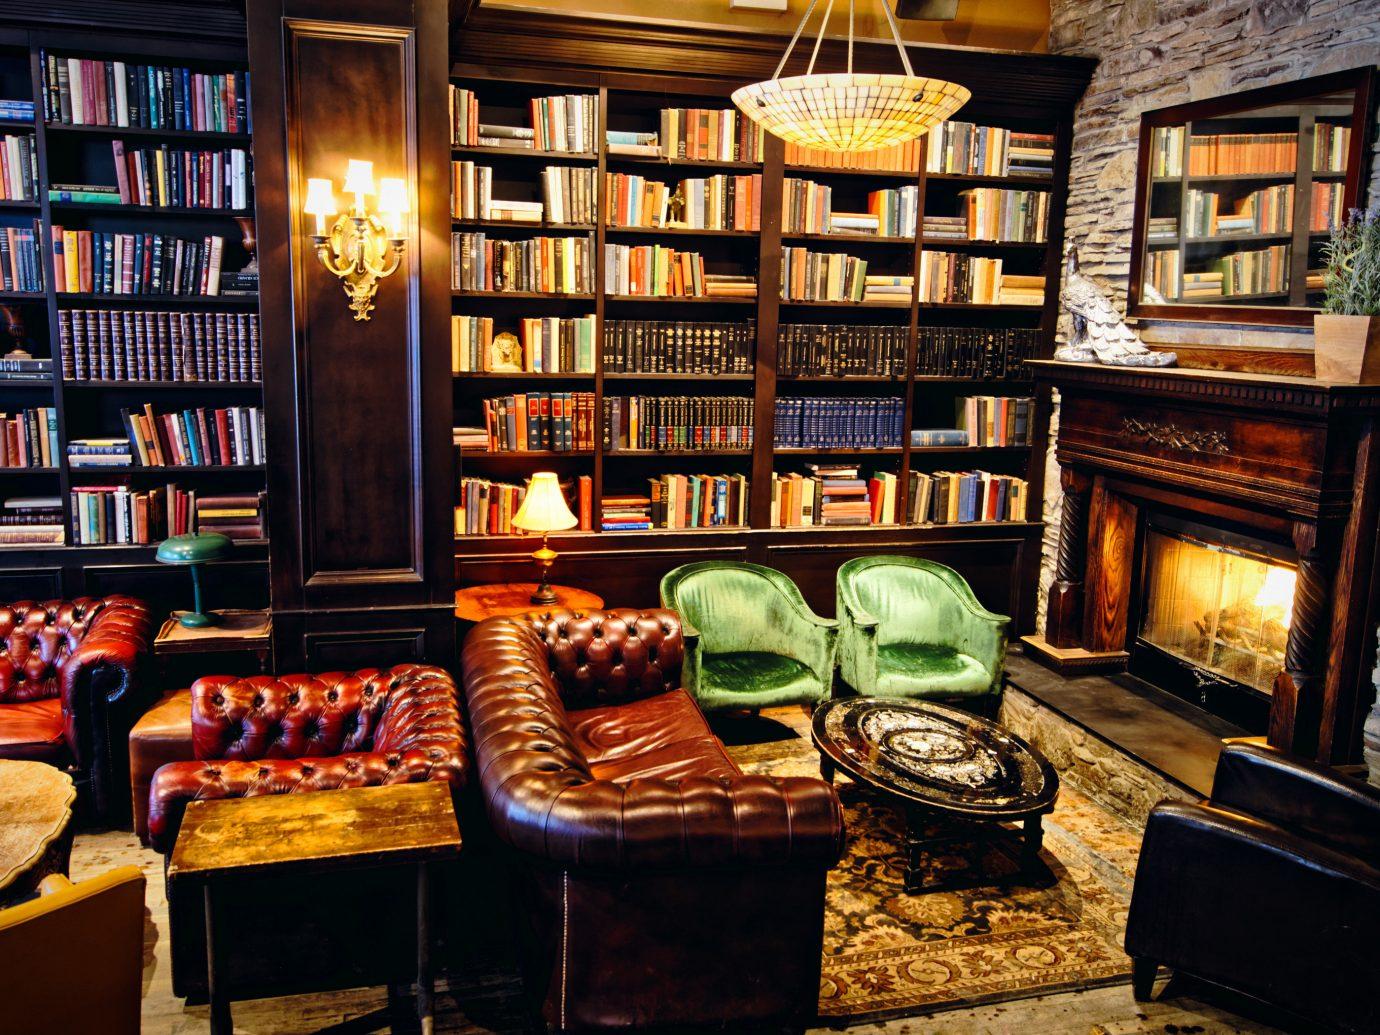 Trip Ideas indoor Living shelf book room building Fireplace home interior design living room estate Bar furniture